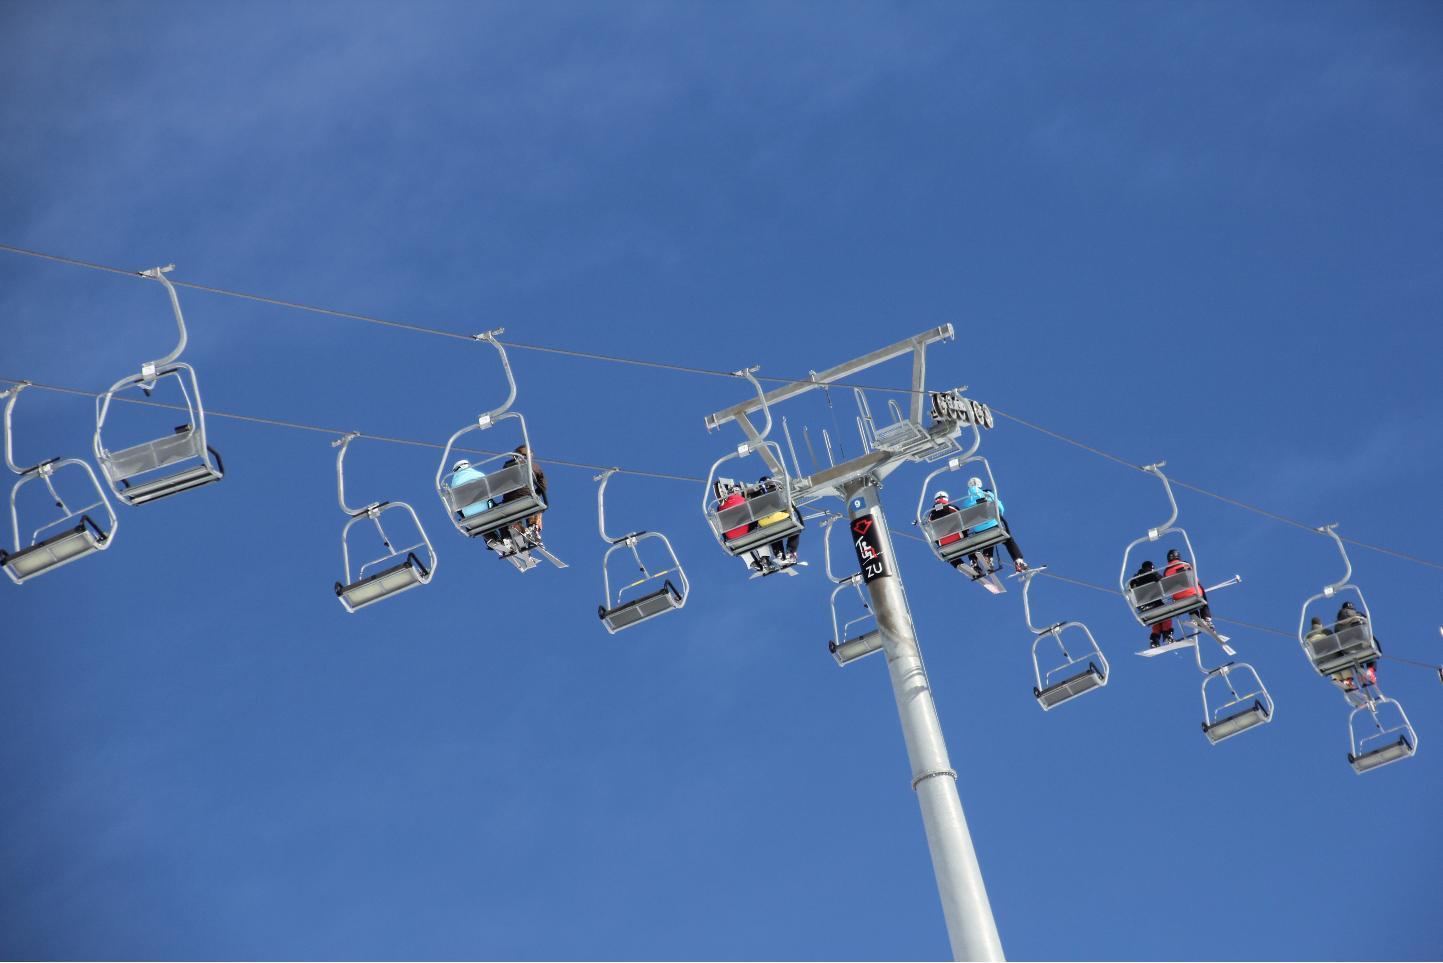 Blue Sky Chair Lift © JonoVernon-Powell